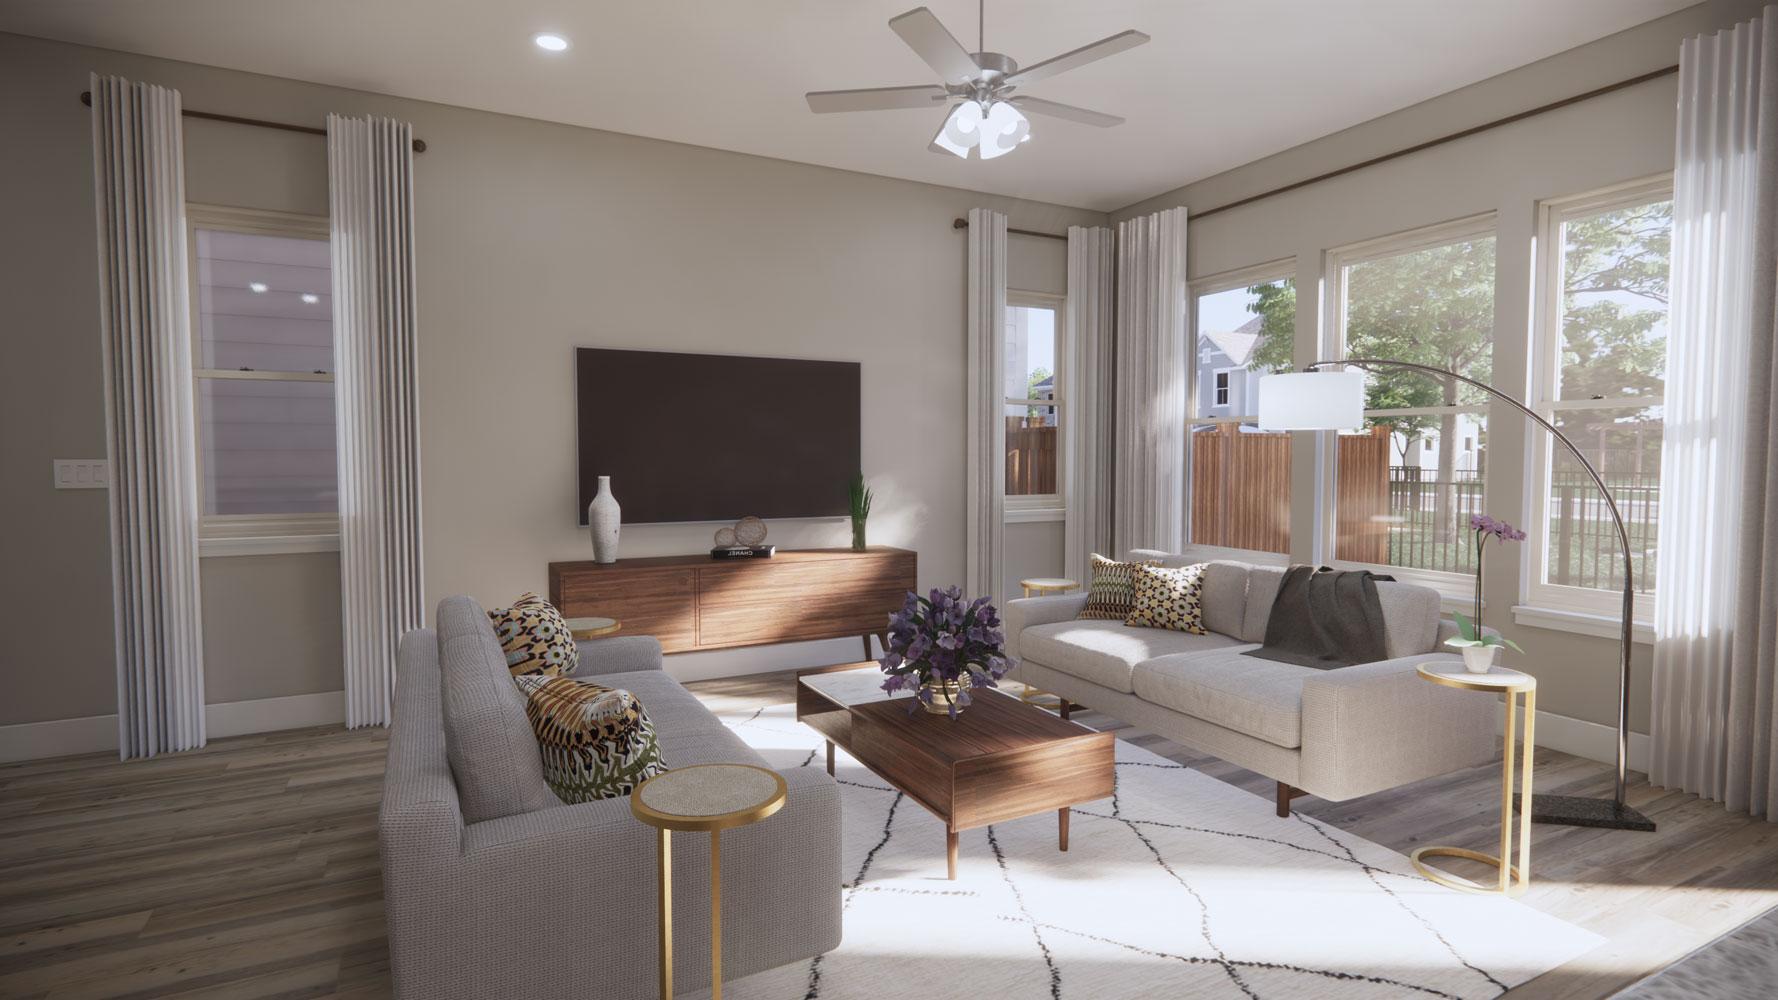 Living Area at Echelon at Reverchon Bluffs in Dallas, Texas